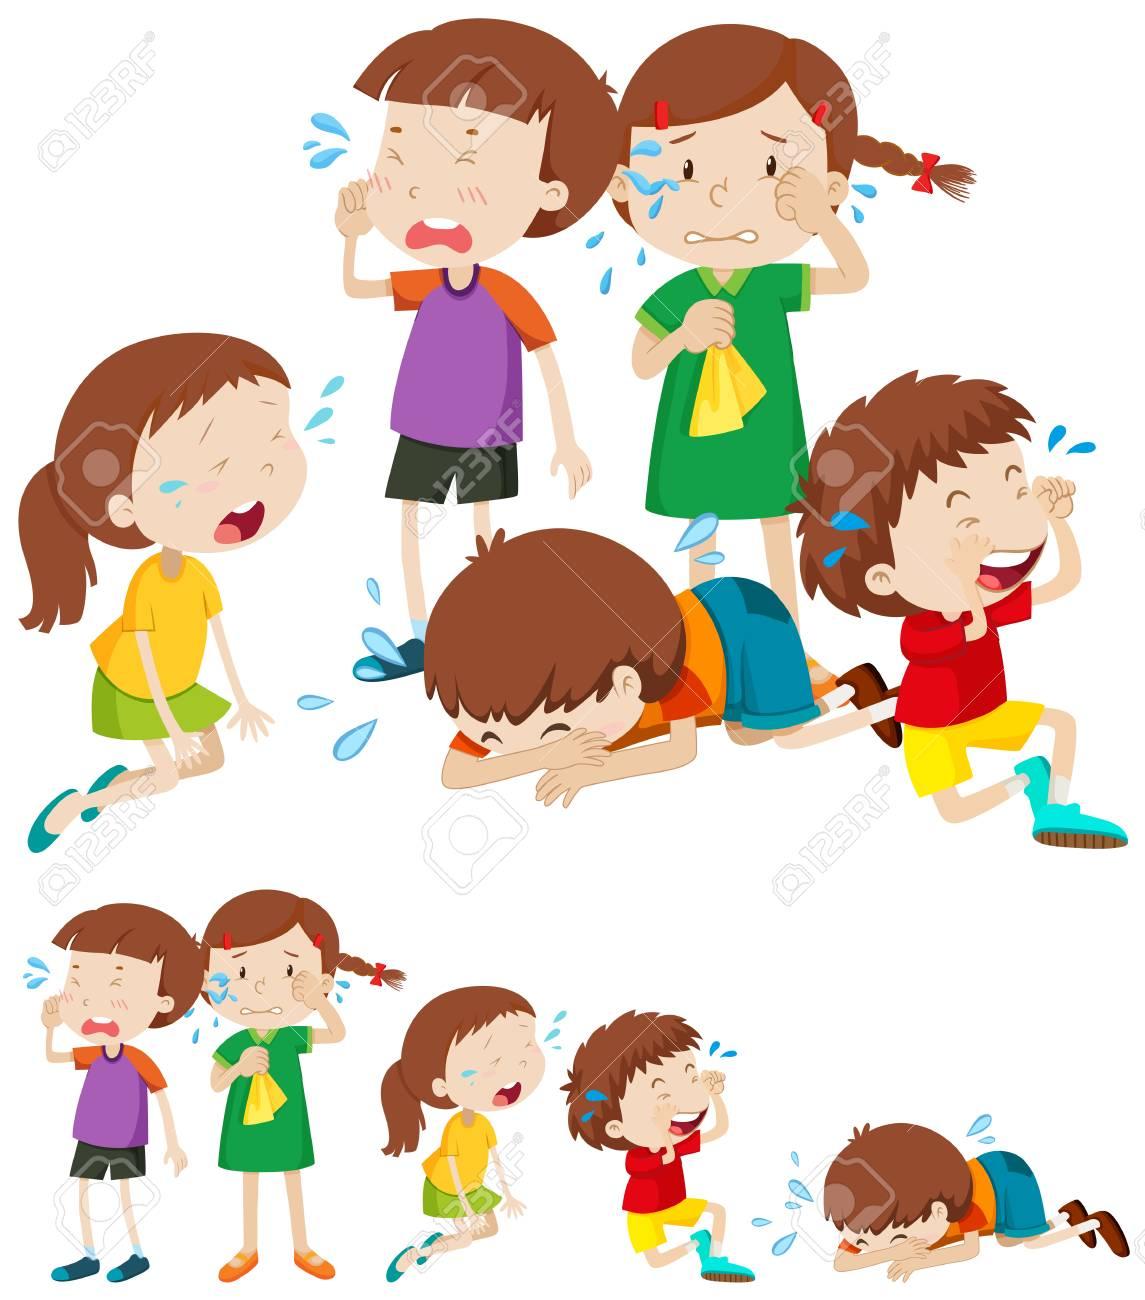 Many sad children crying illustration.